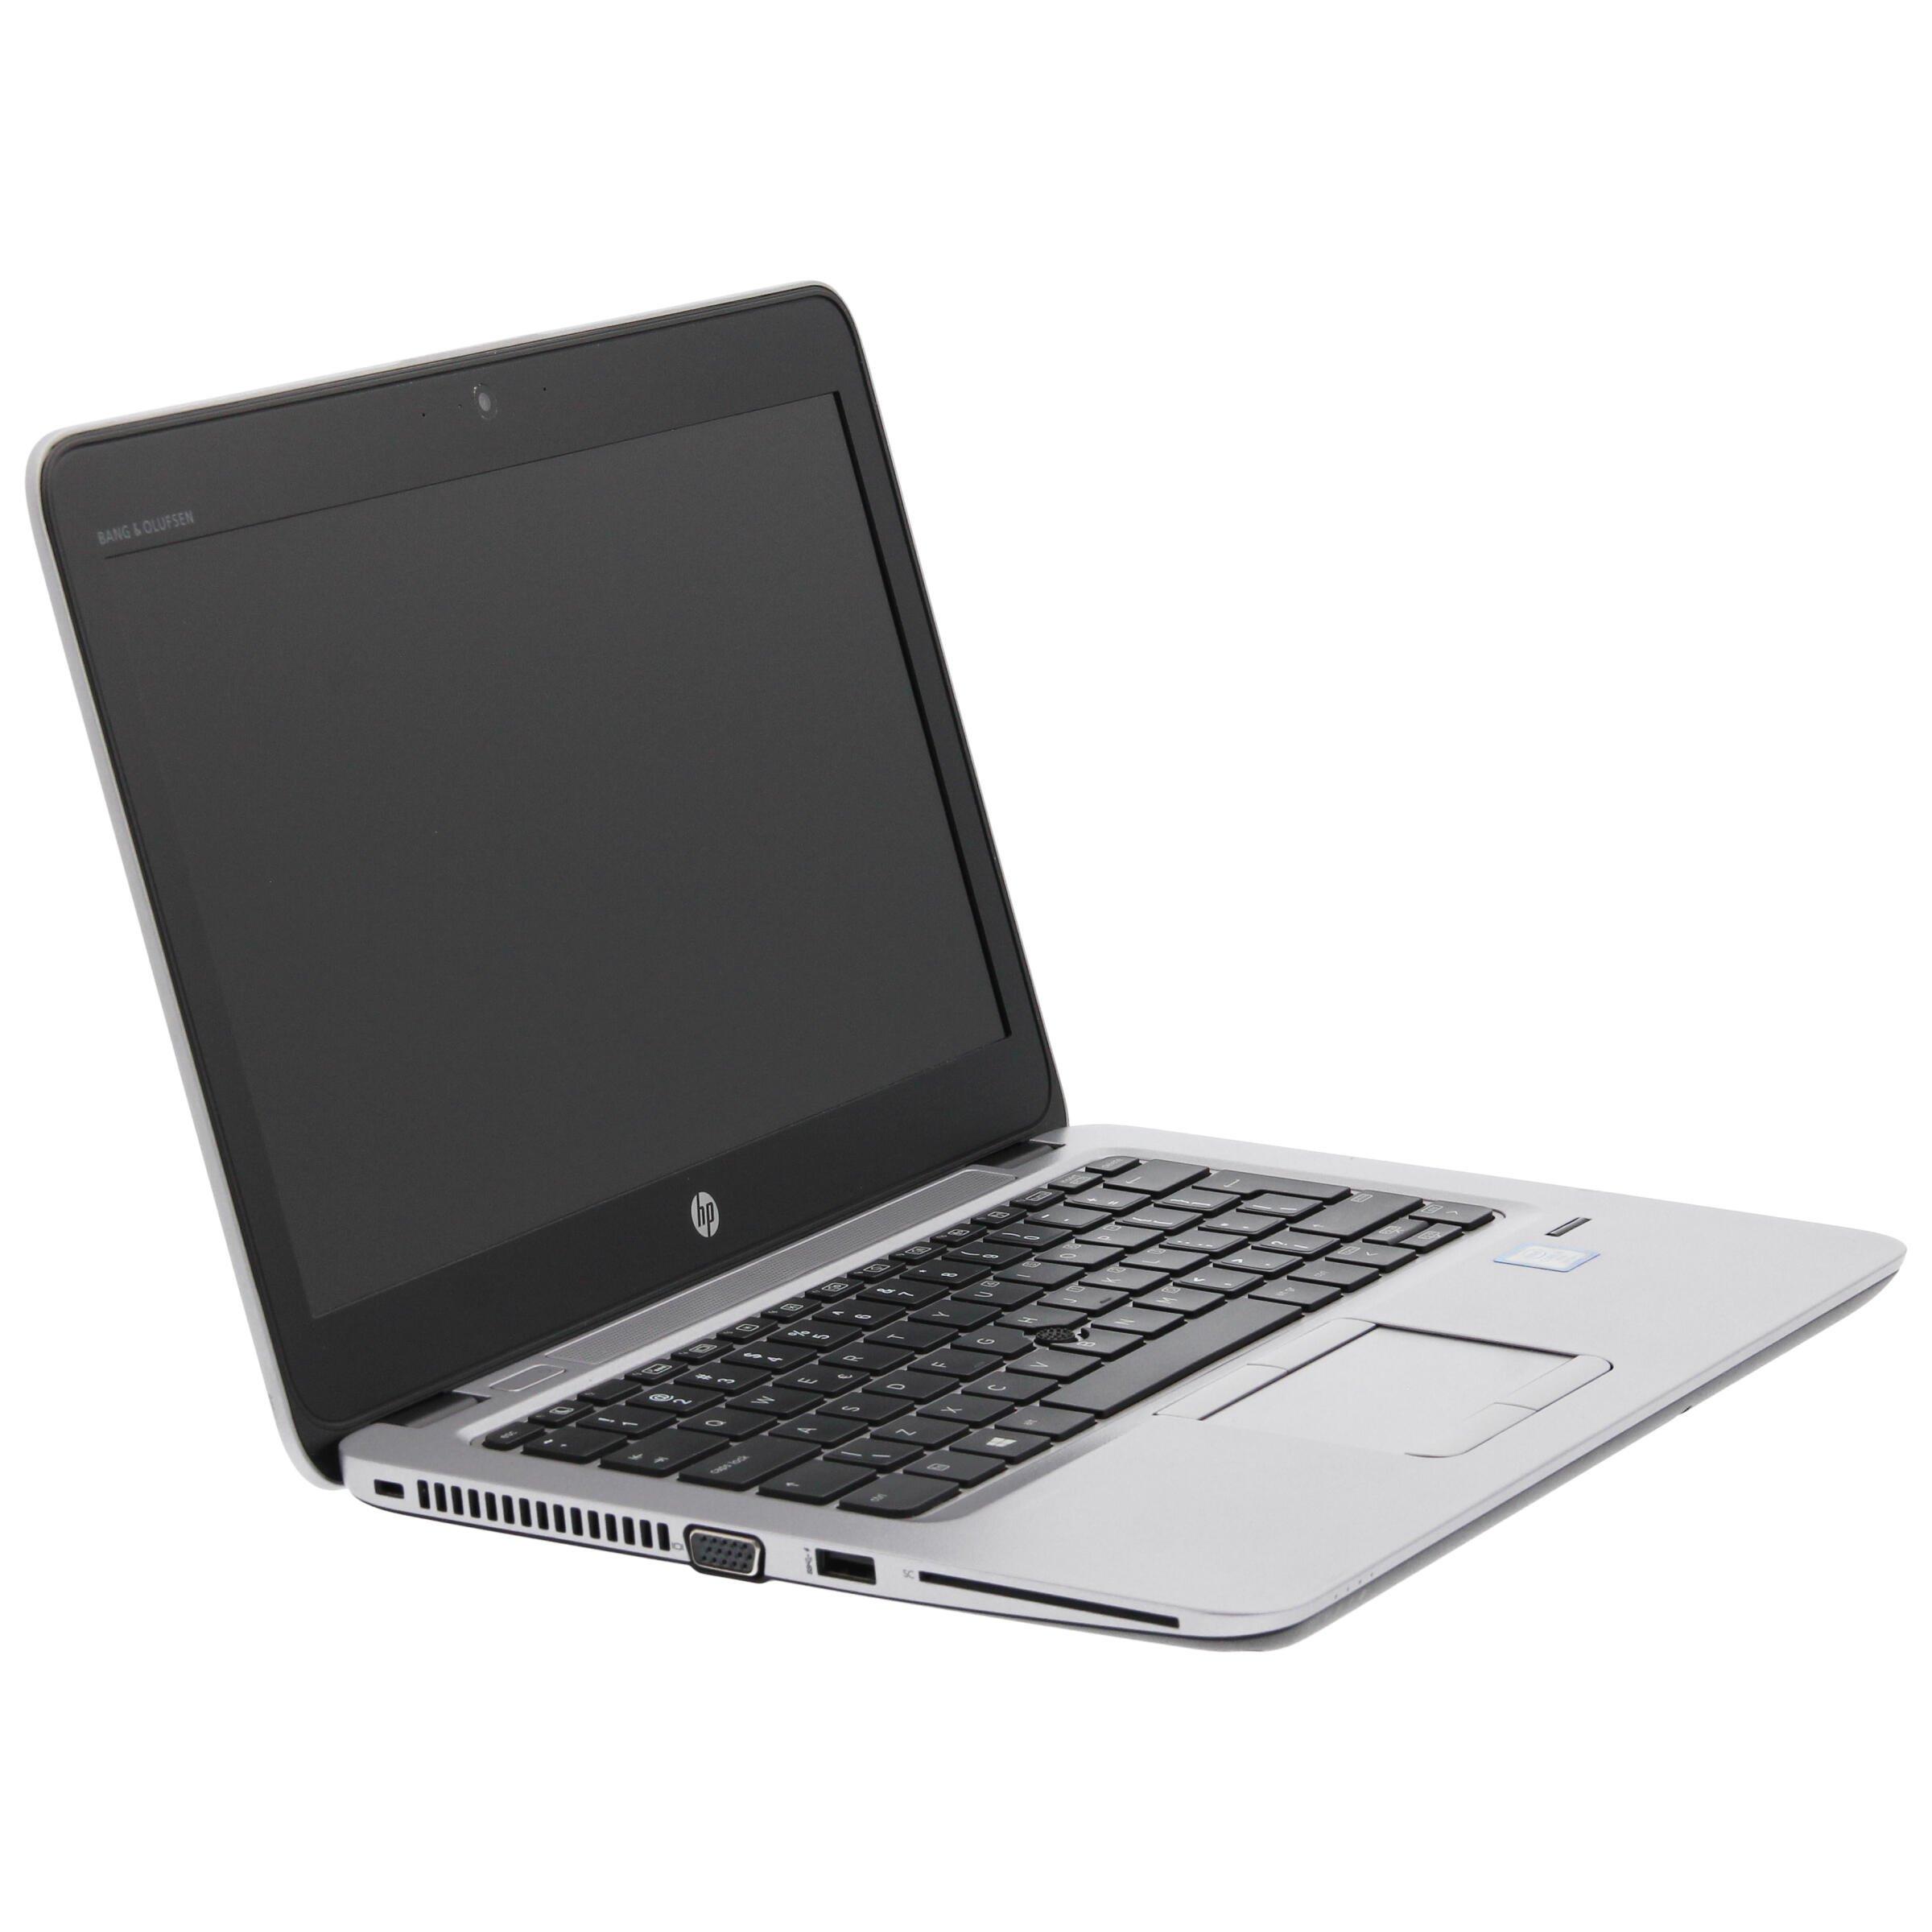 mały laptop hp rnew